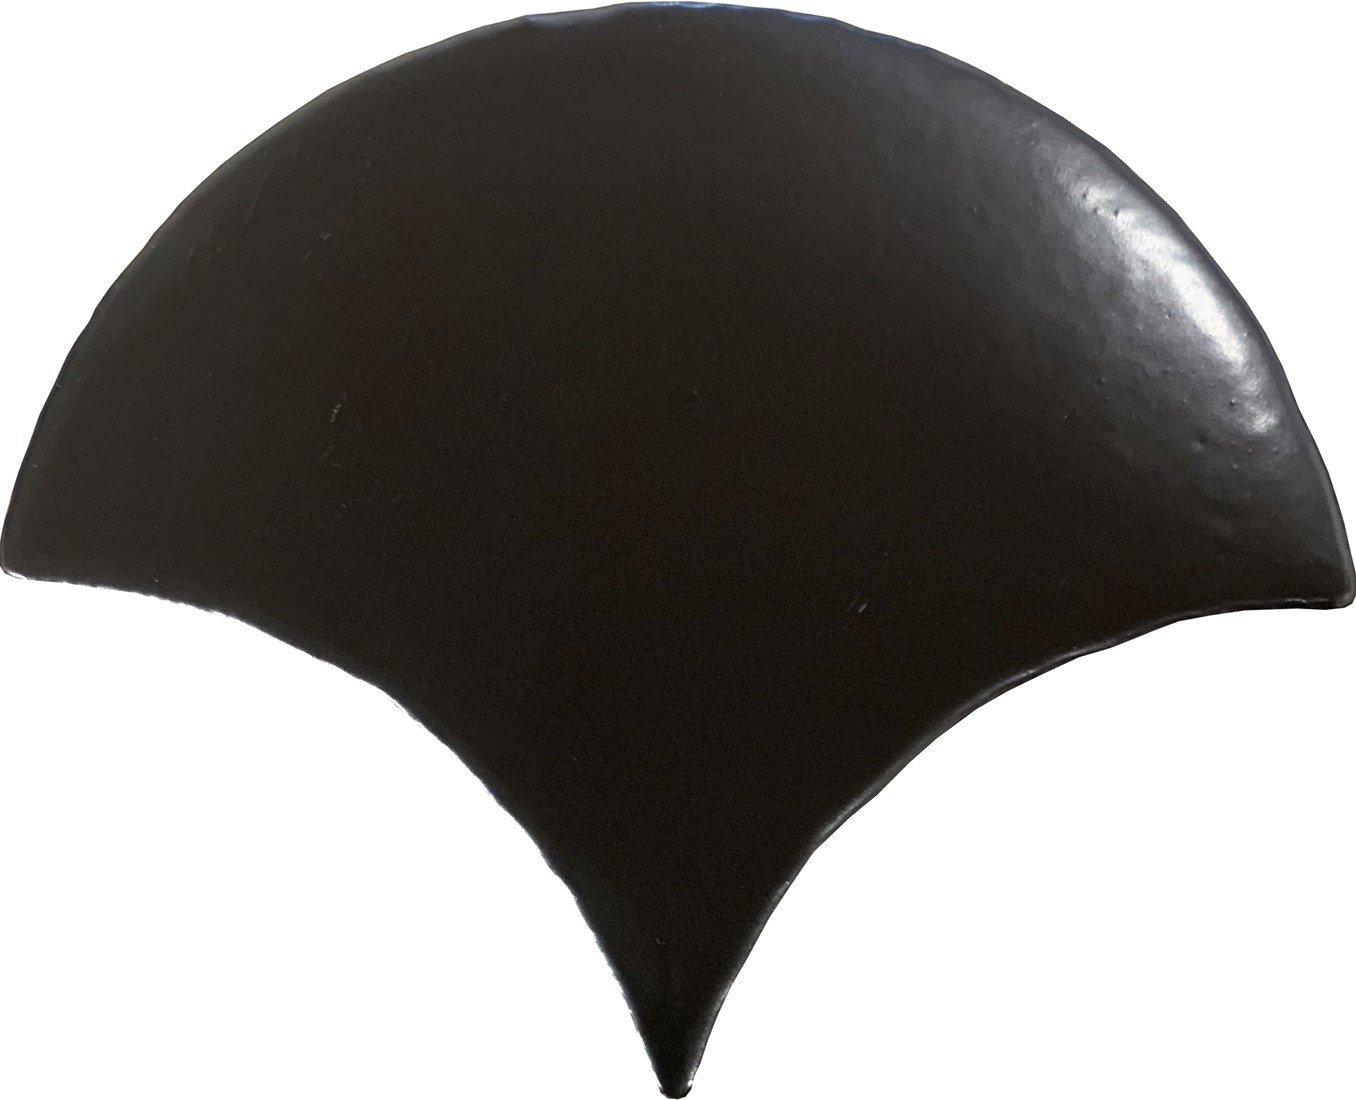 Alcoceram schubben tegel Manual Escama 11,5X10 Negro Mate